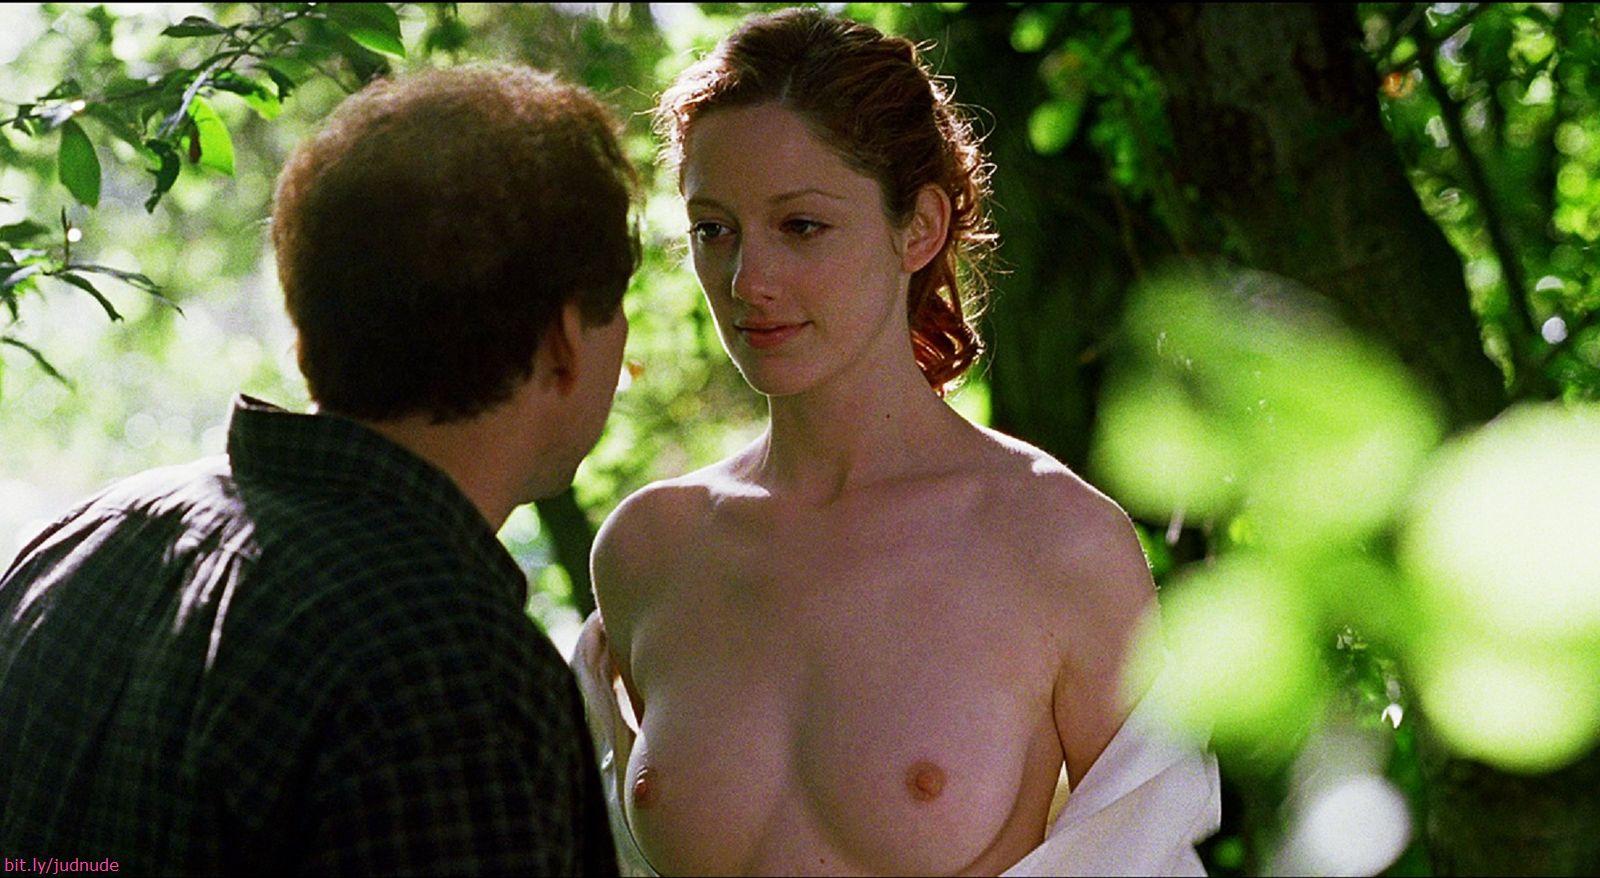 judy greer naked